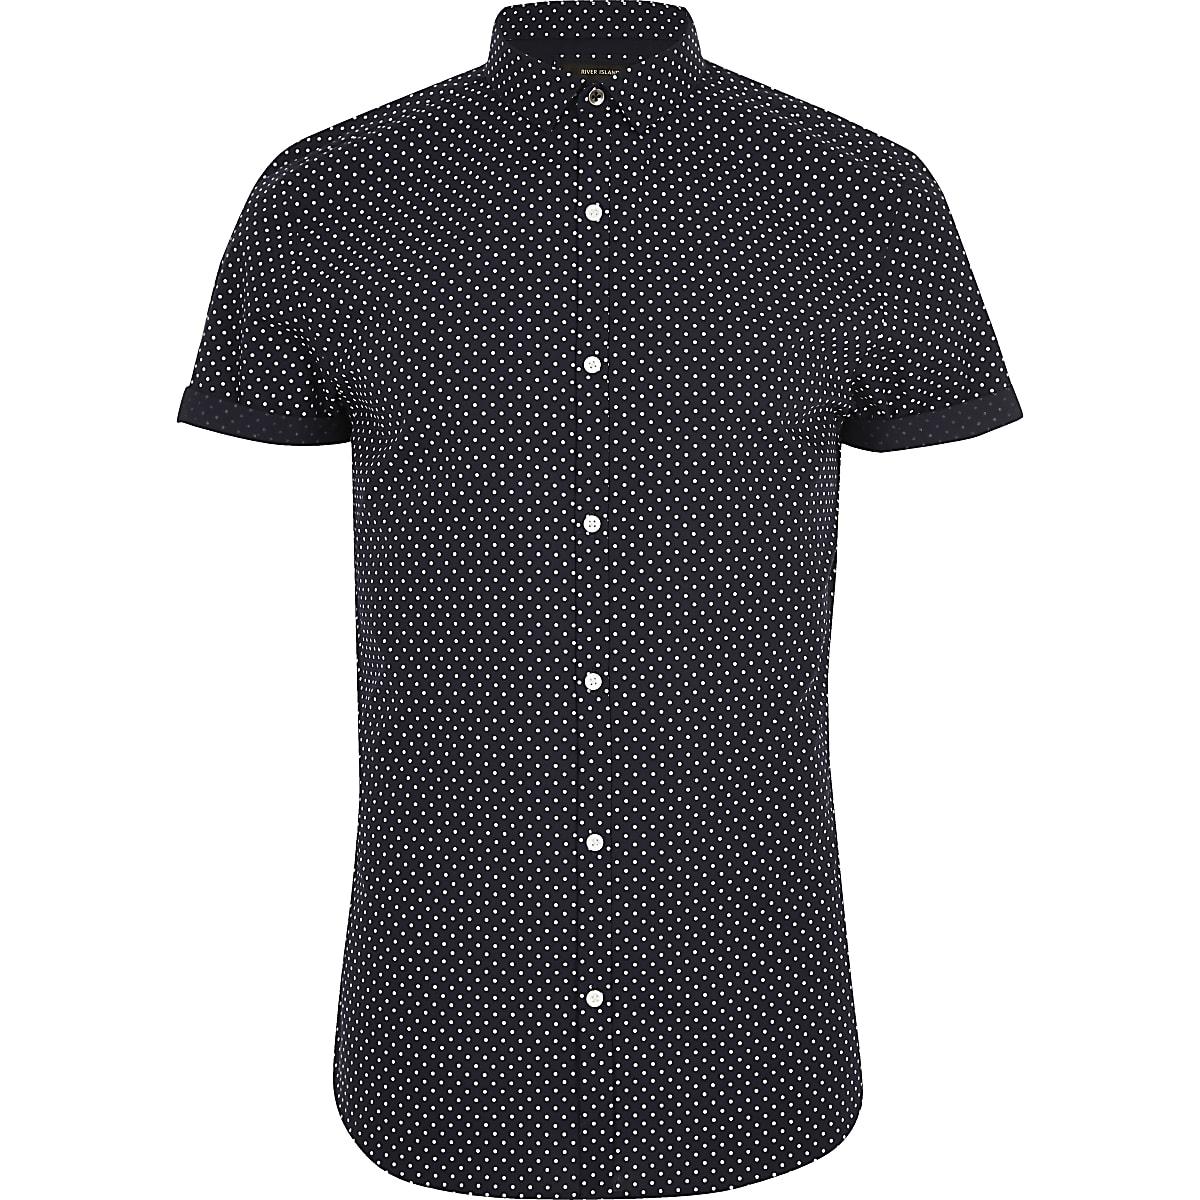 Navy polka dot short sleeve slim fit shirt